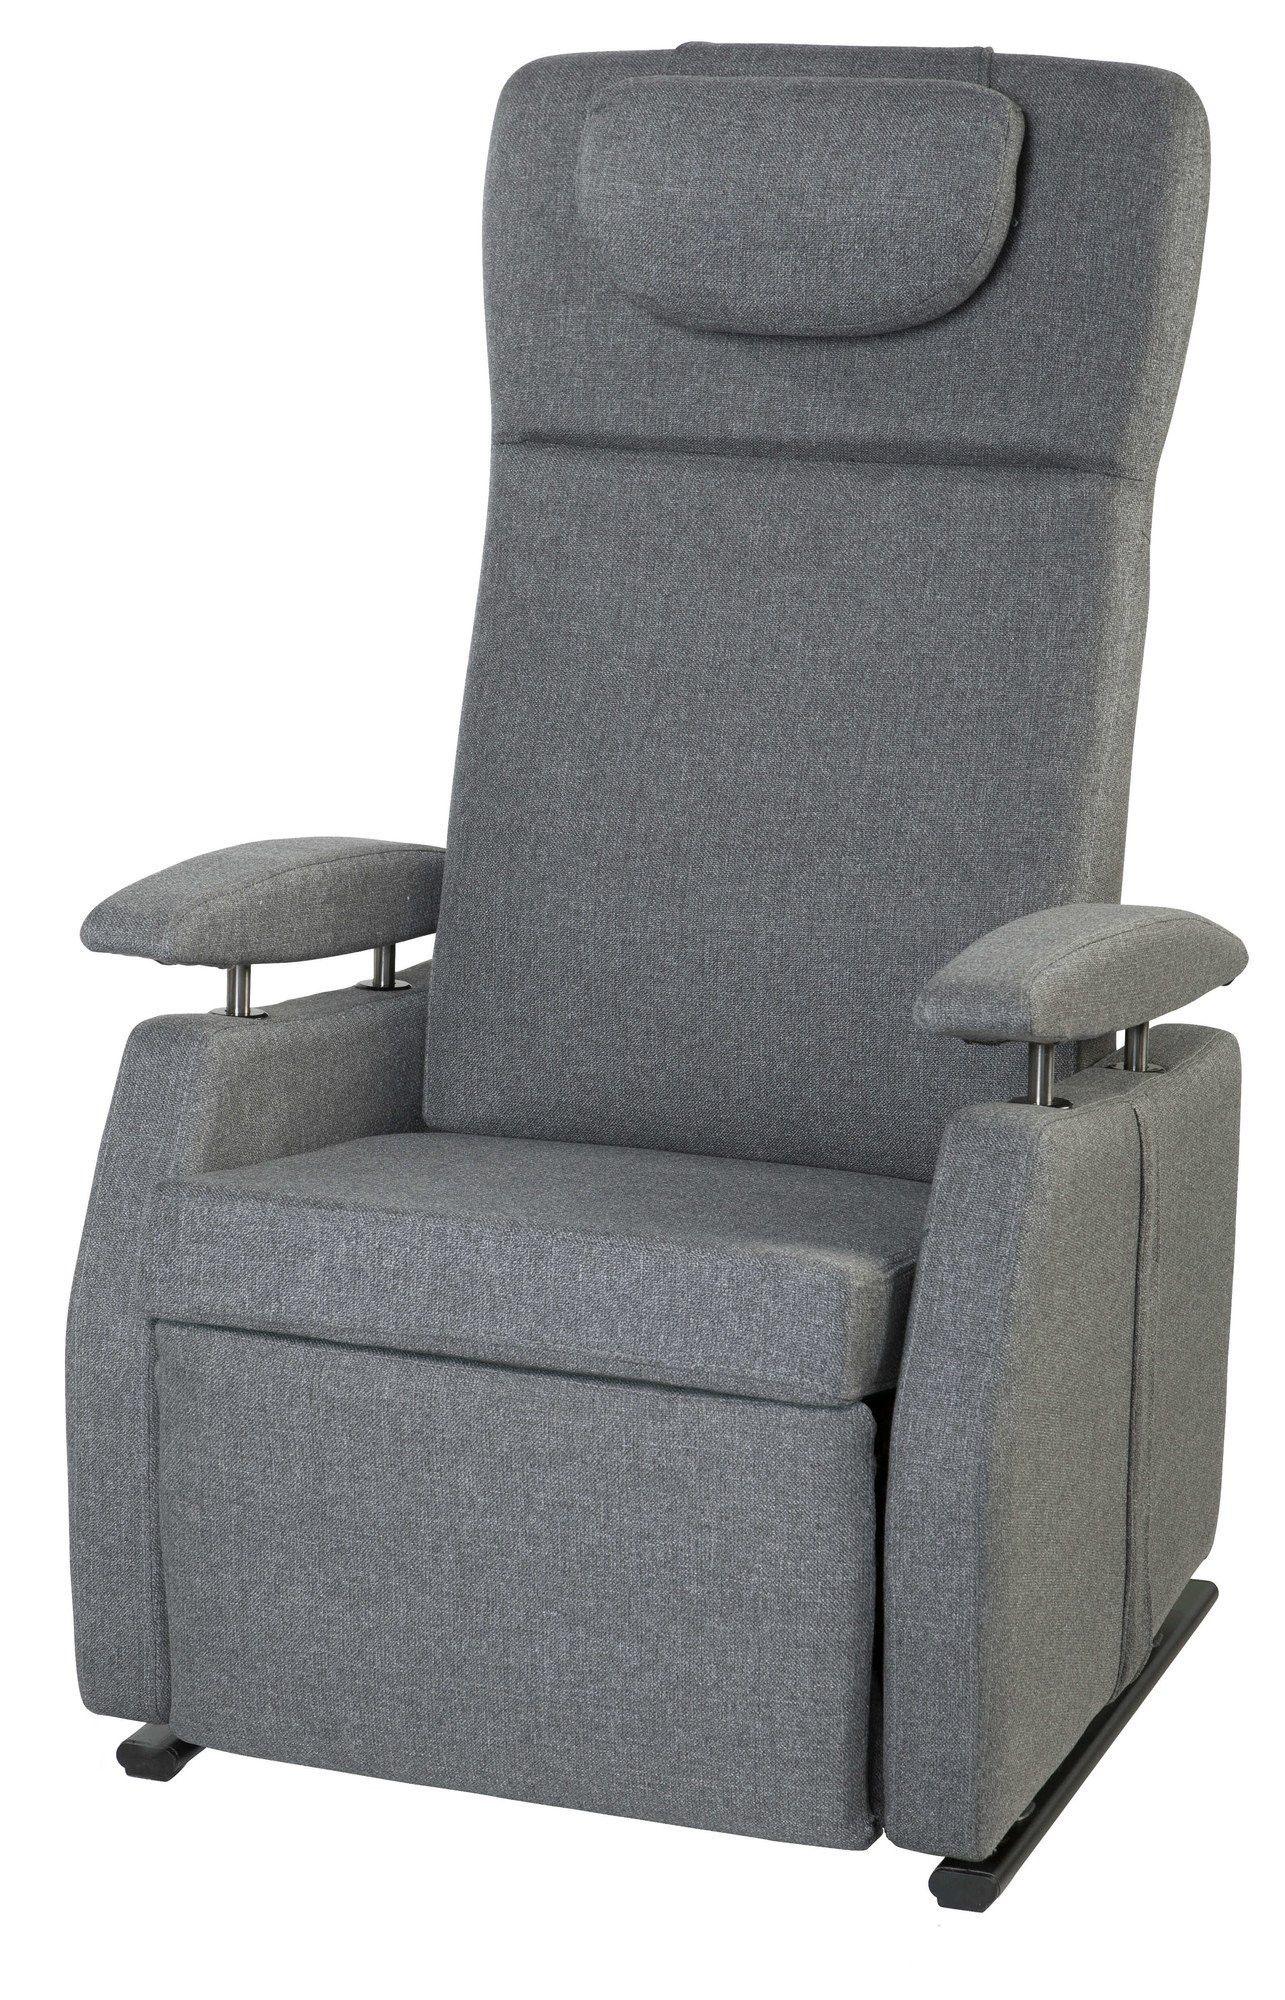 fitform 574 vario sta op stoel kopen hulpmiddelwereld. Black Bedroom Furniture Sets. Home Design Ideas